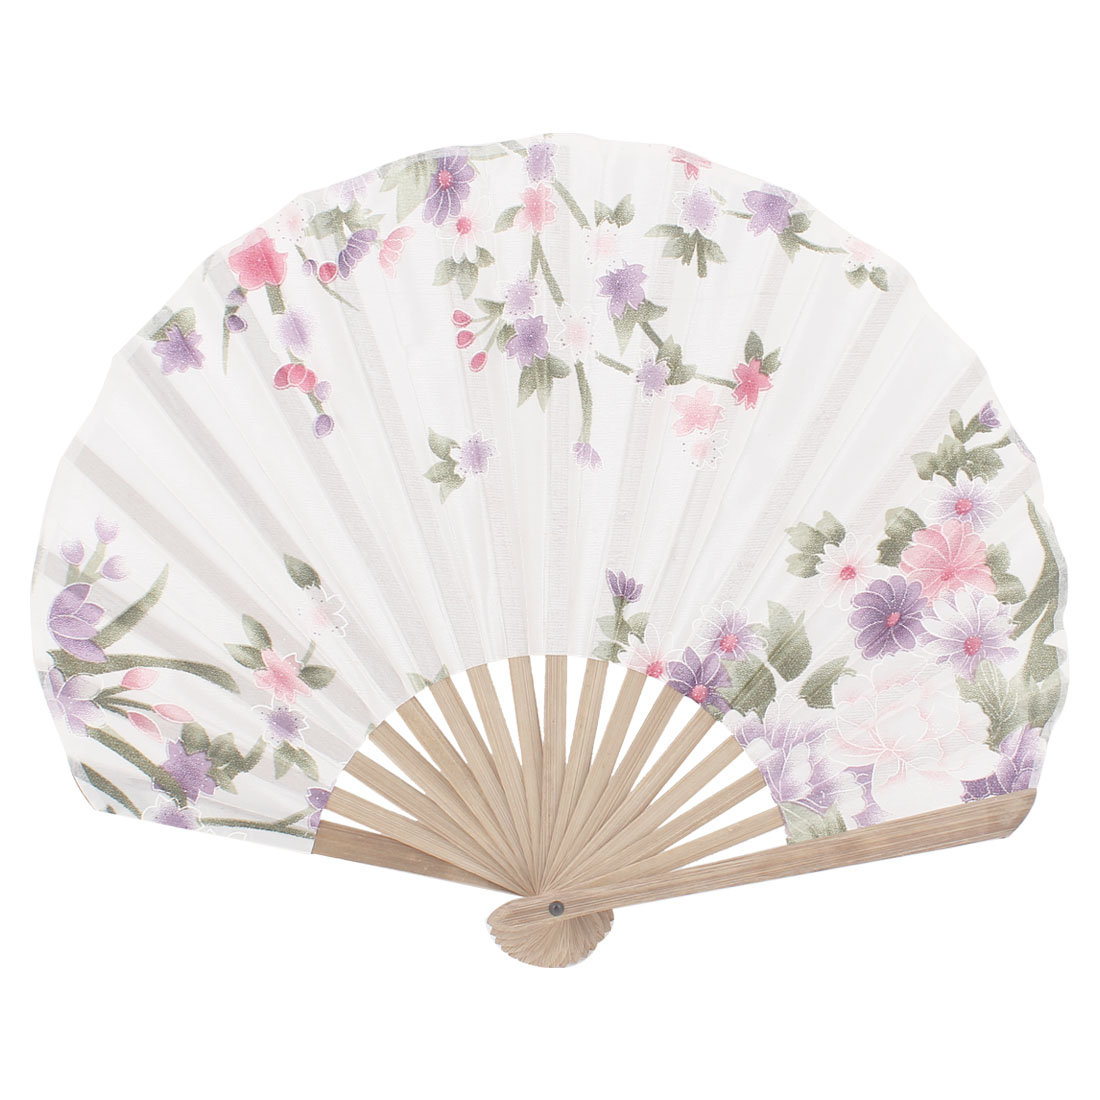 Seashell Design Bamboo Frame Flower Pattern Cool Foldable Hand Fan Off White